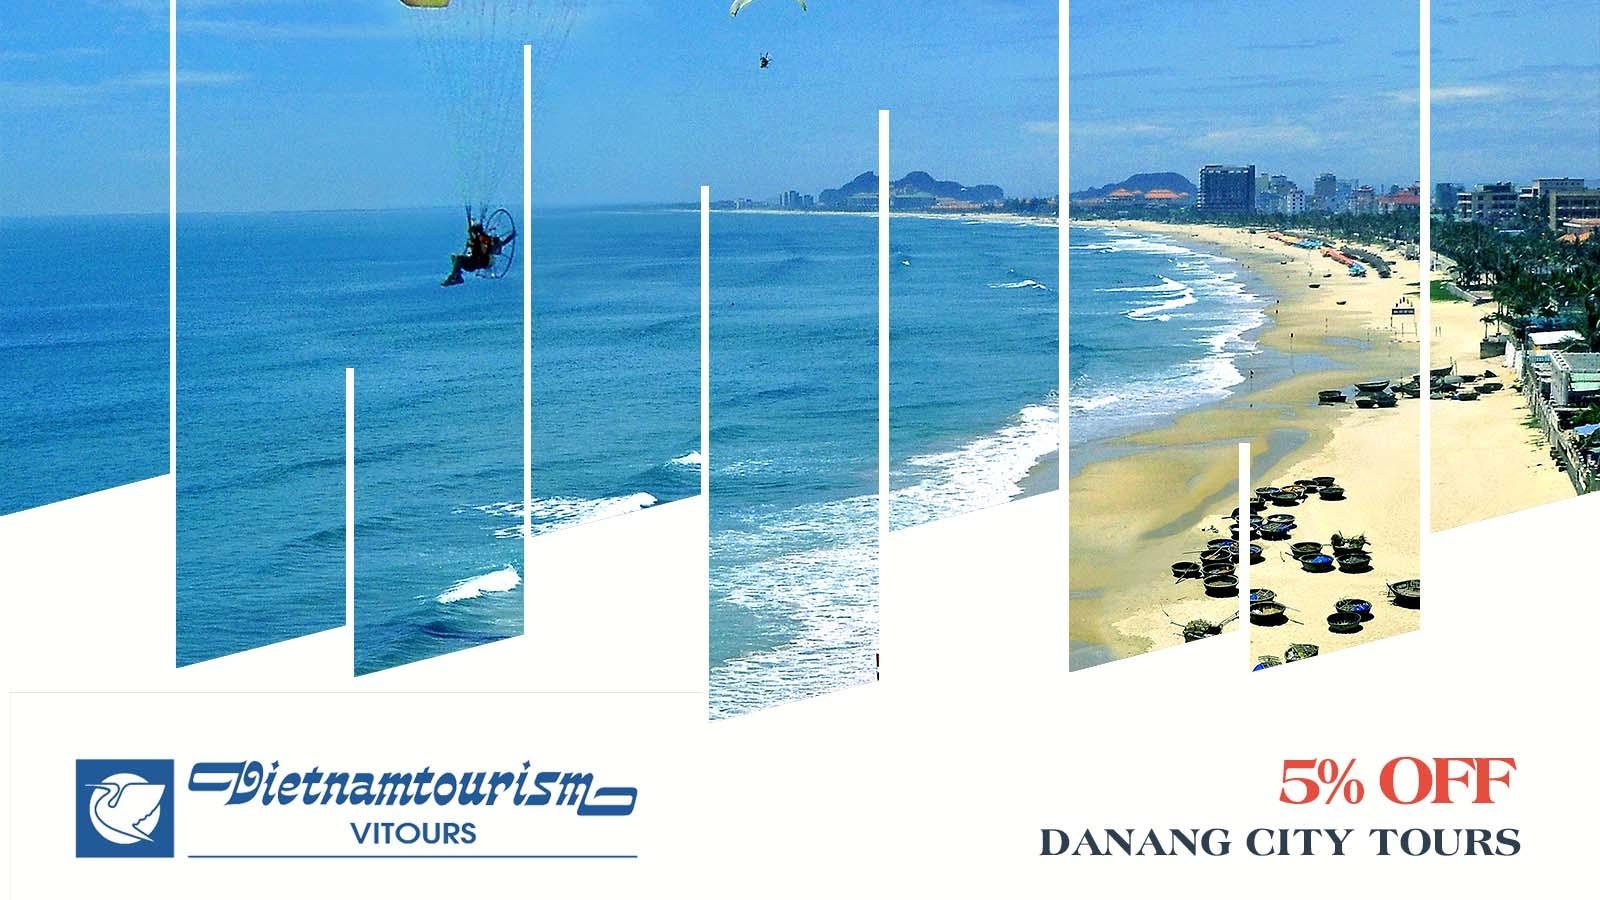 Vitours 5% OFF Danang City Tours 1